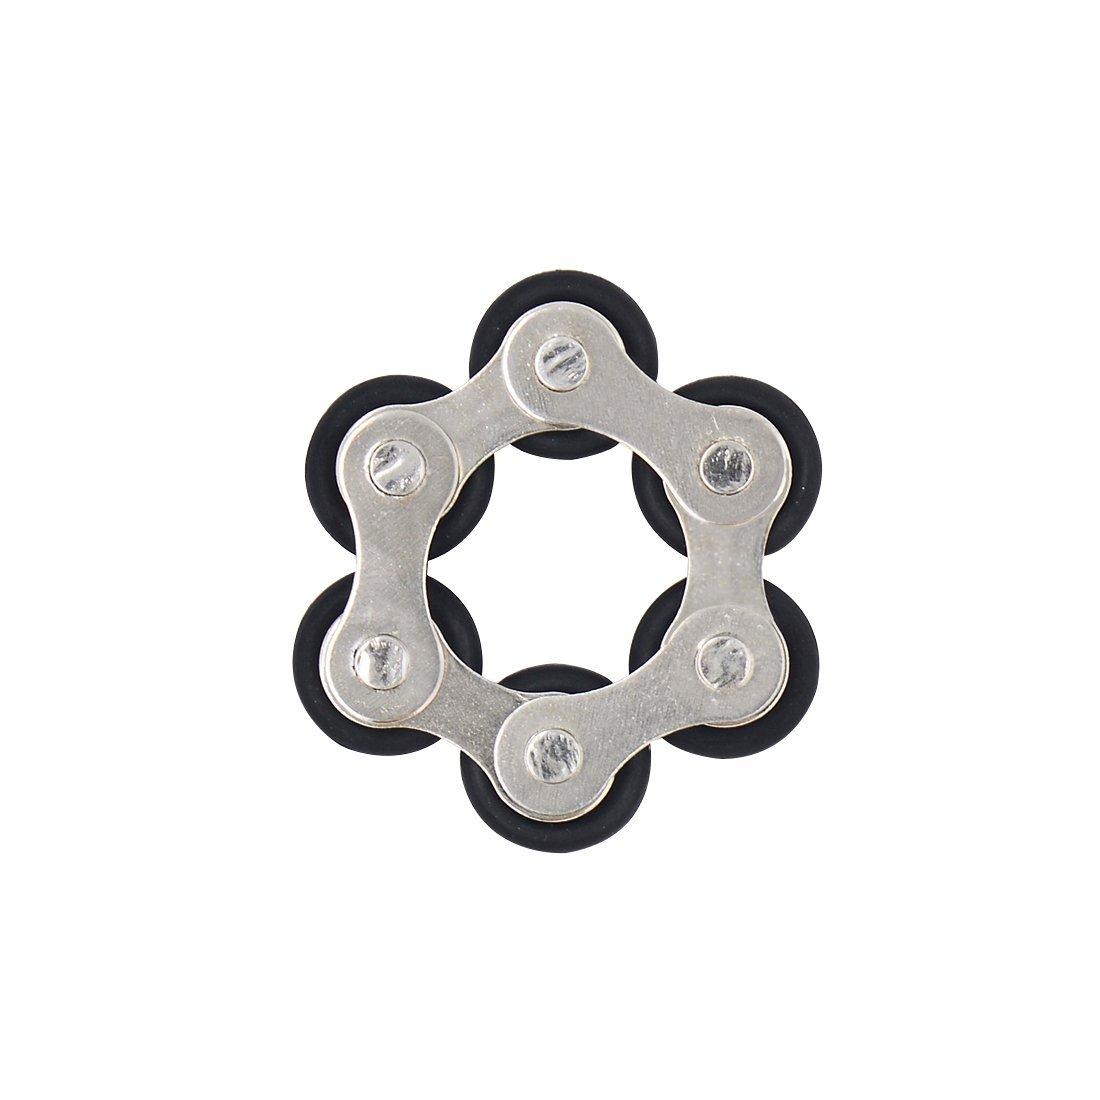 Eachway Roller Chain Fidget Toy